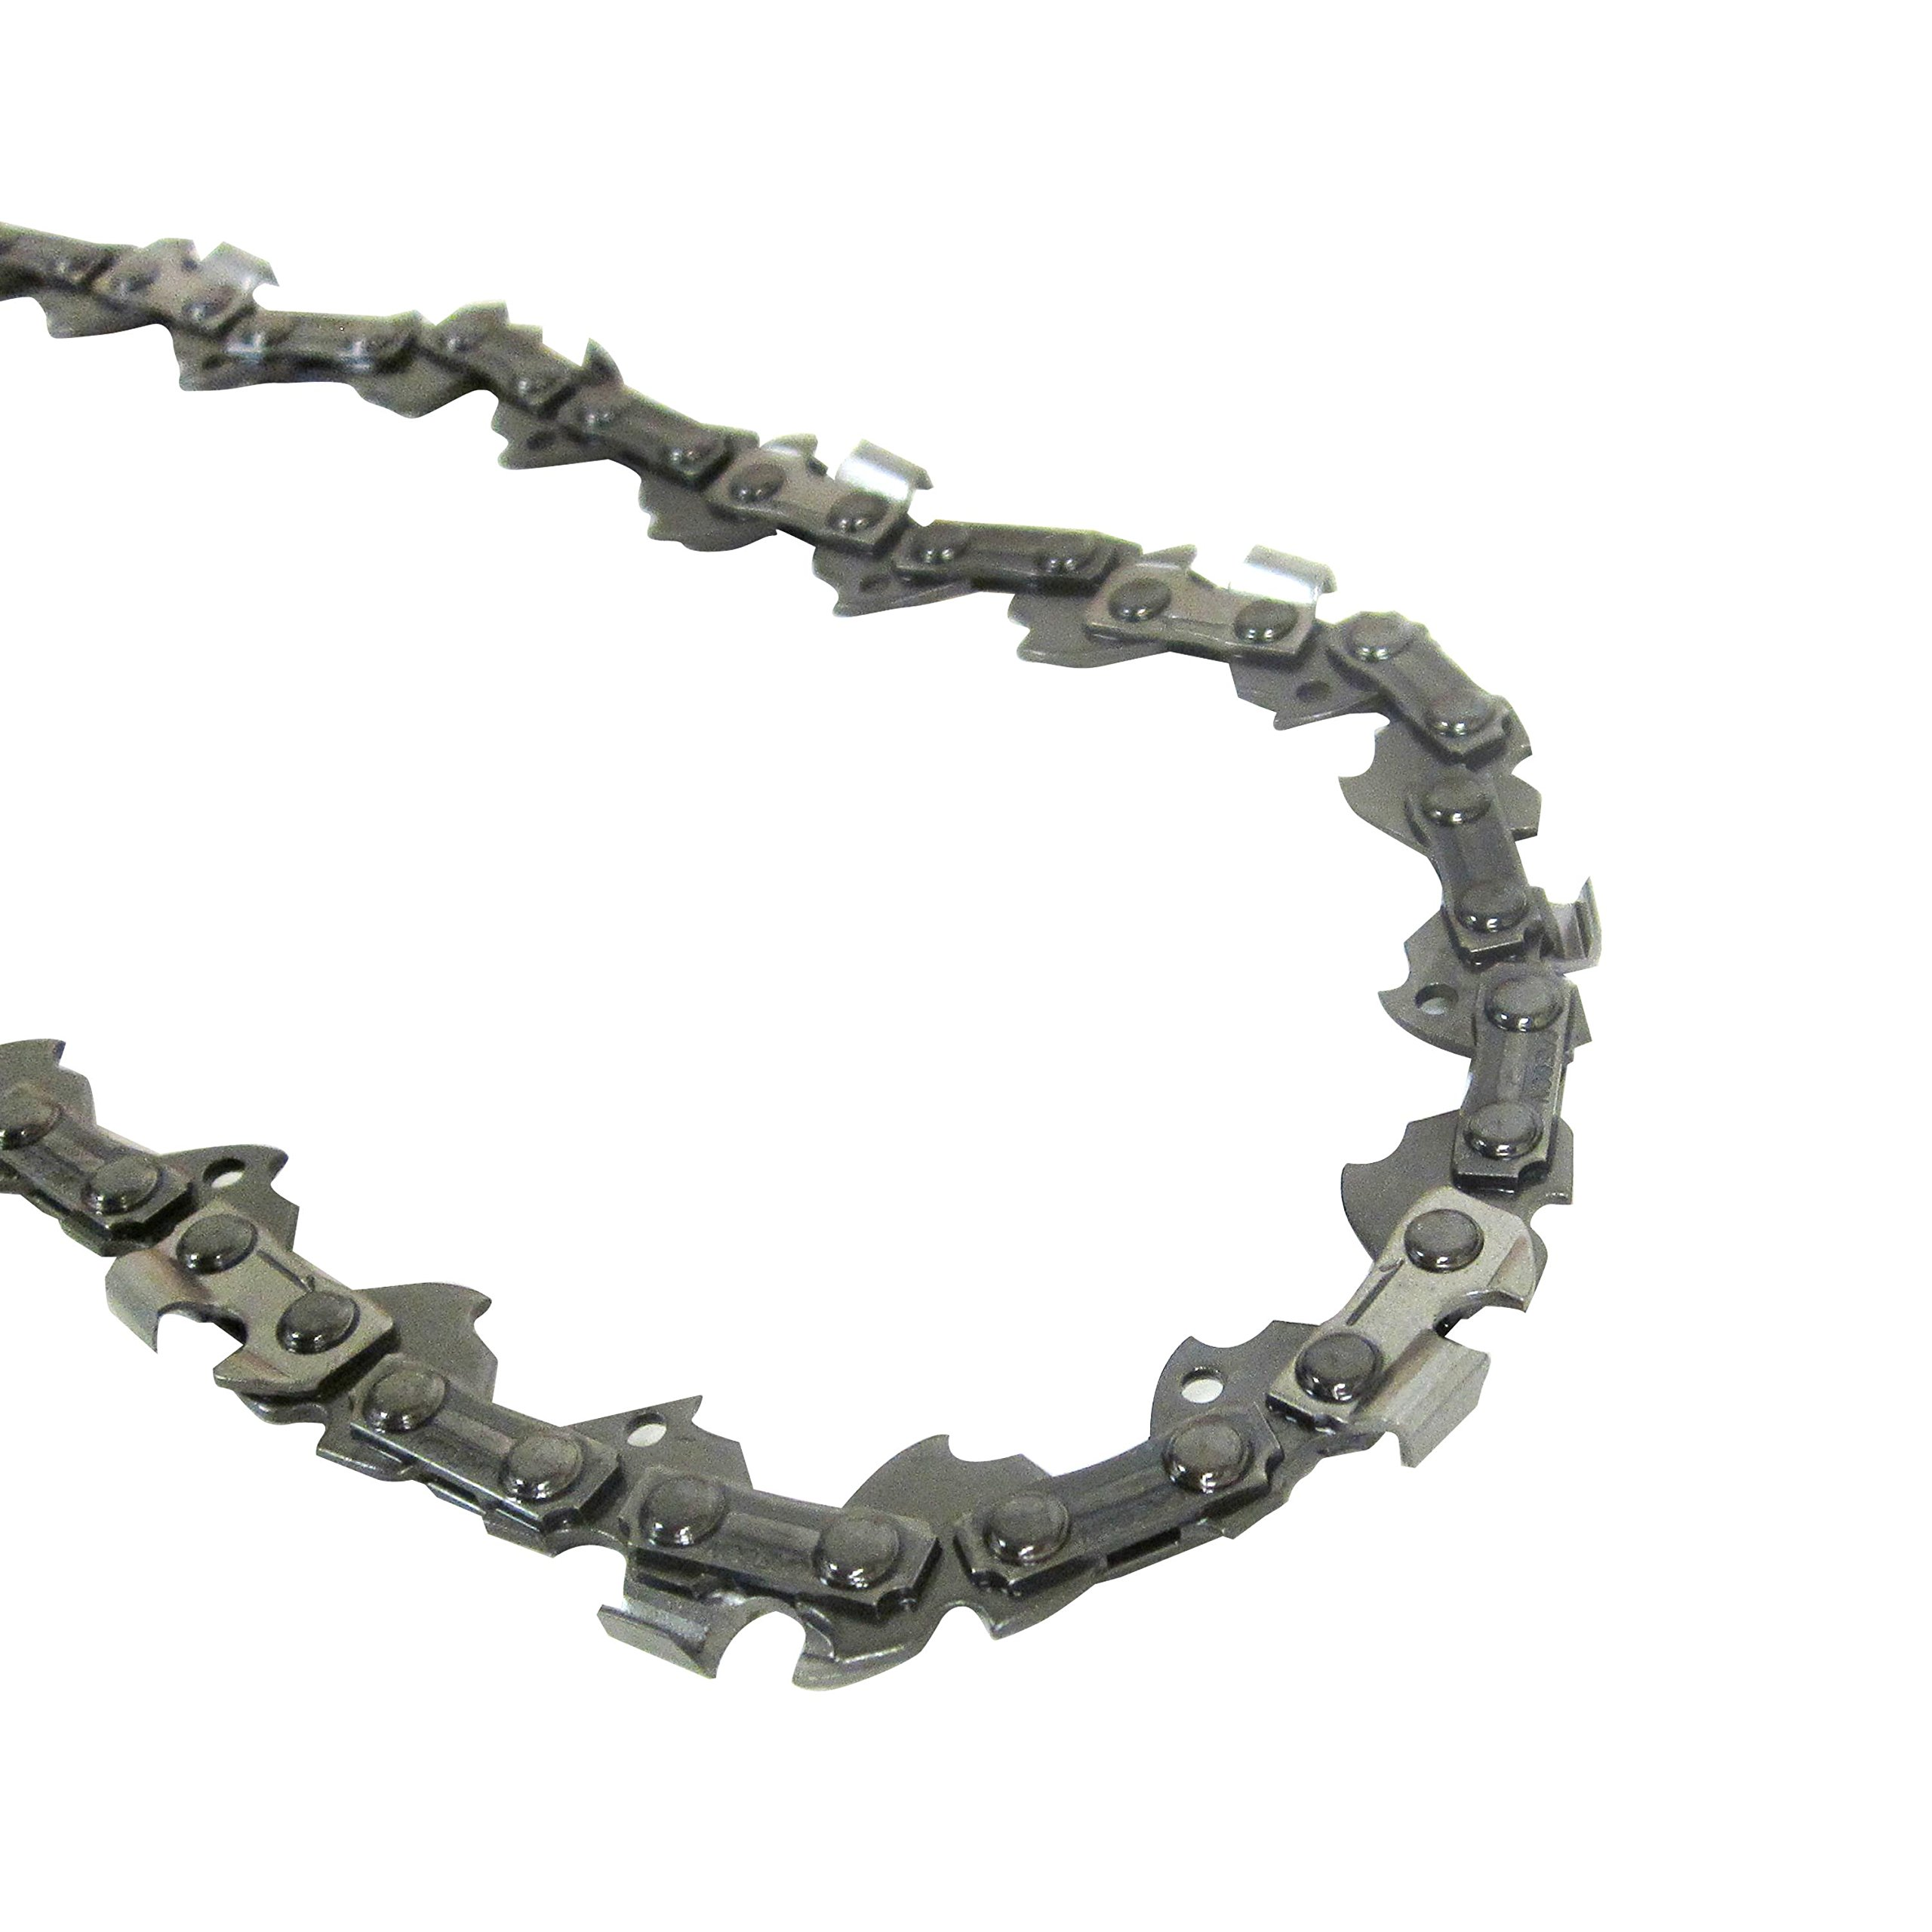 Sun Joe SWJ-10CHAIN 10'' Replacement Semi-Chisel Chain for SWJ803E/SWJ807E Pole Chain Saws